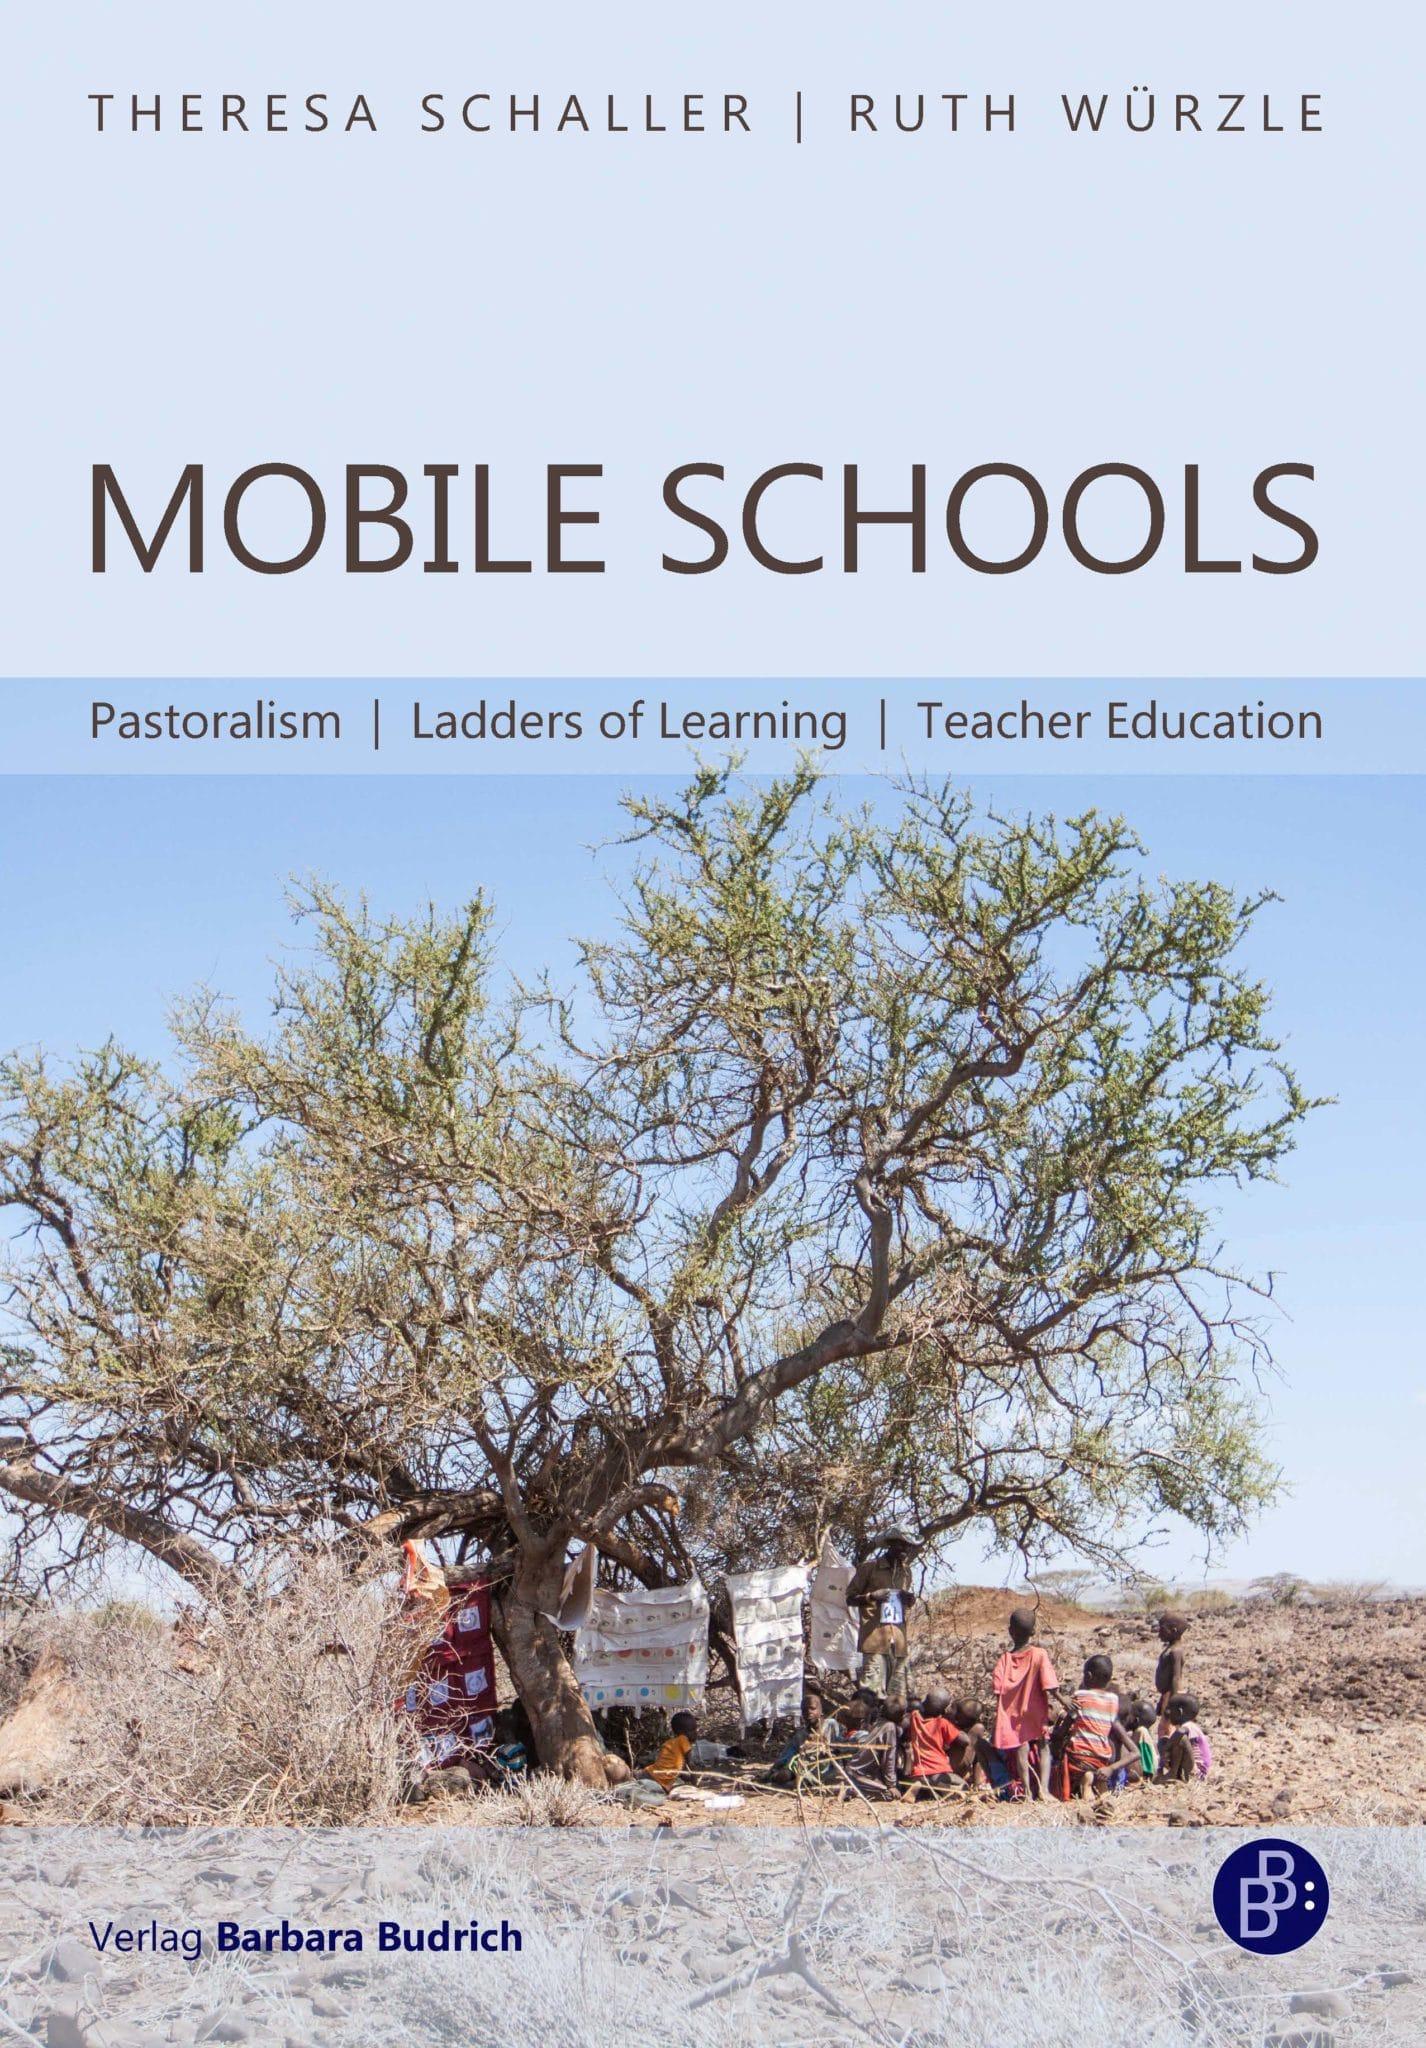 Schaller/Würzle: Mobile Schools. Pastoralism, Ladders of Learning, Teacher Education. Verlag Barbara Budrich. ED: 14.12.2020